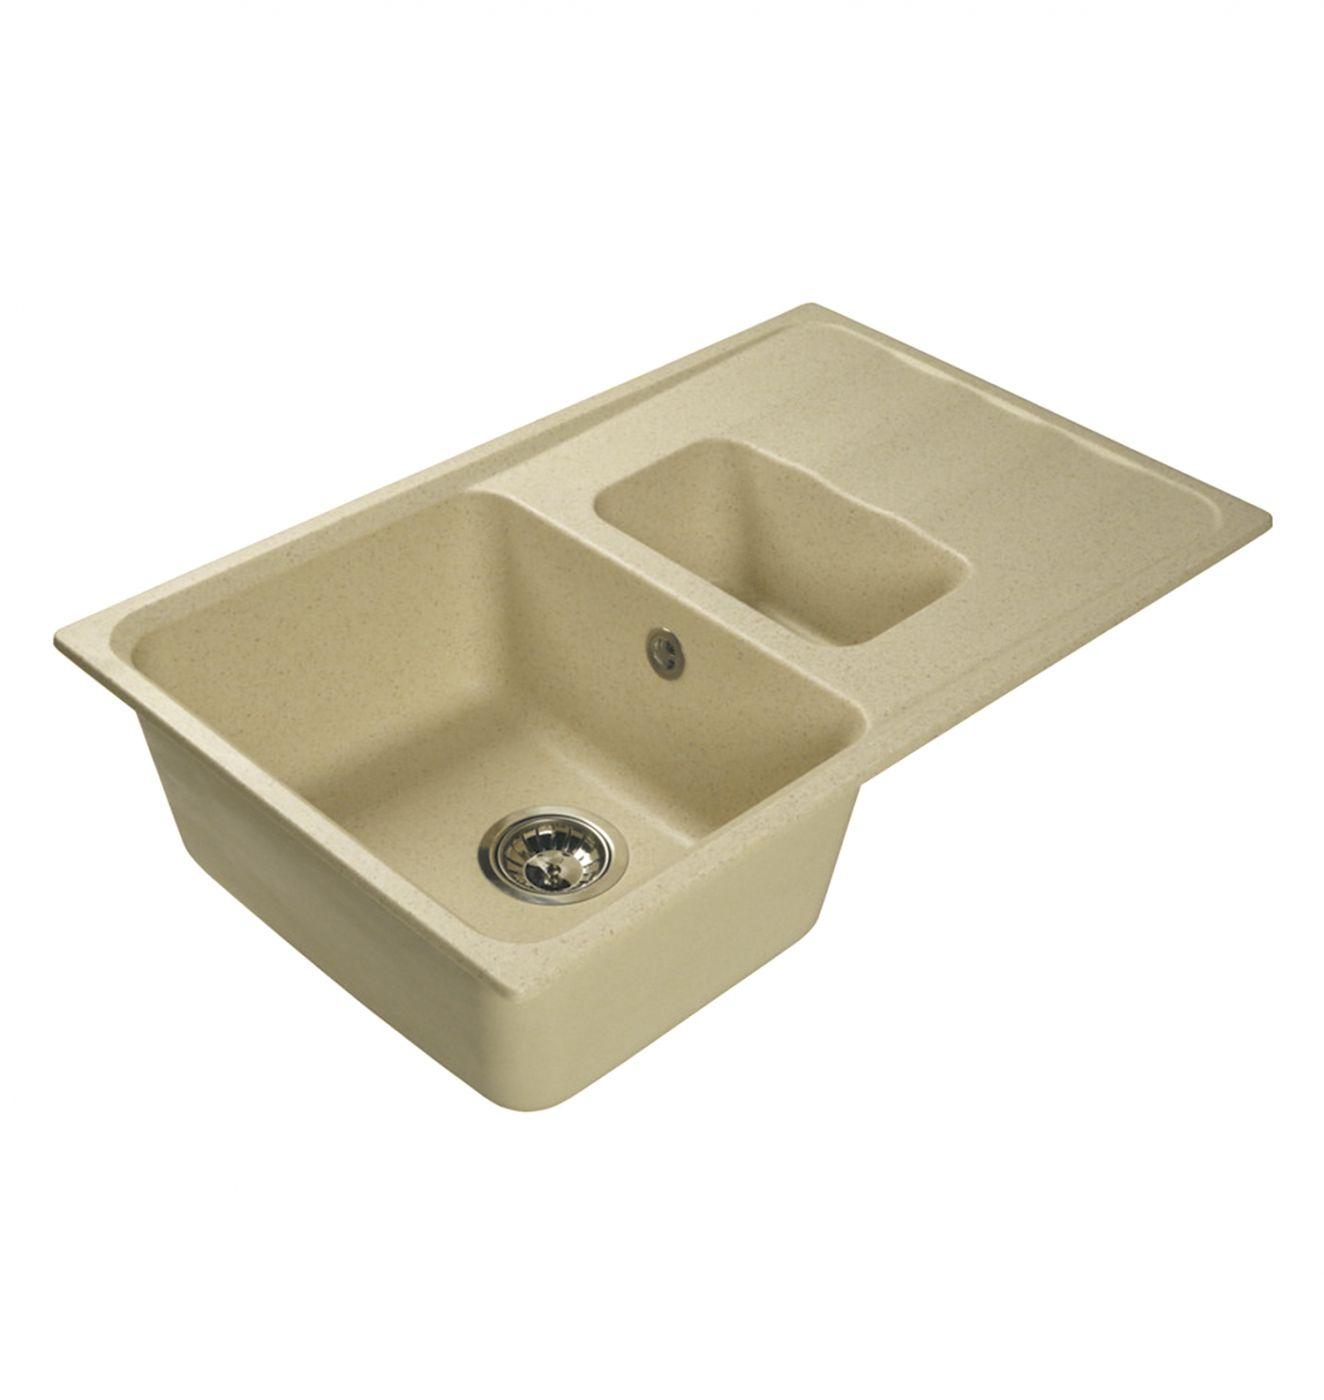 Врезная кухонная мойка LEX Maggiore 780 Ivory  78х49см искусственный мрамор RULE000118